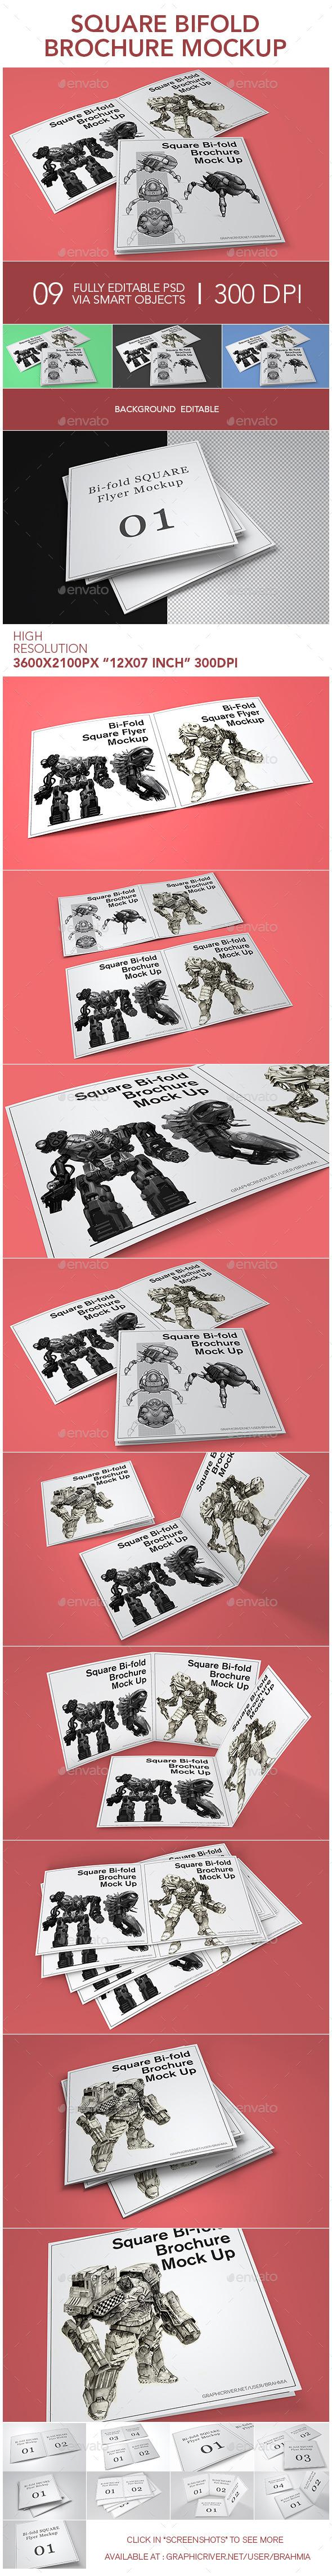 Square Bifold Brochure Mockup - Brochures Print